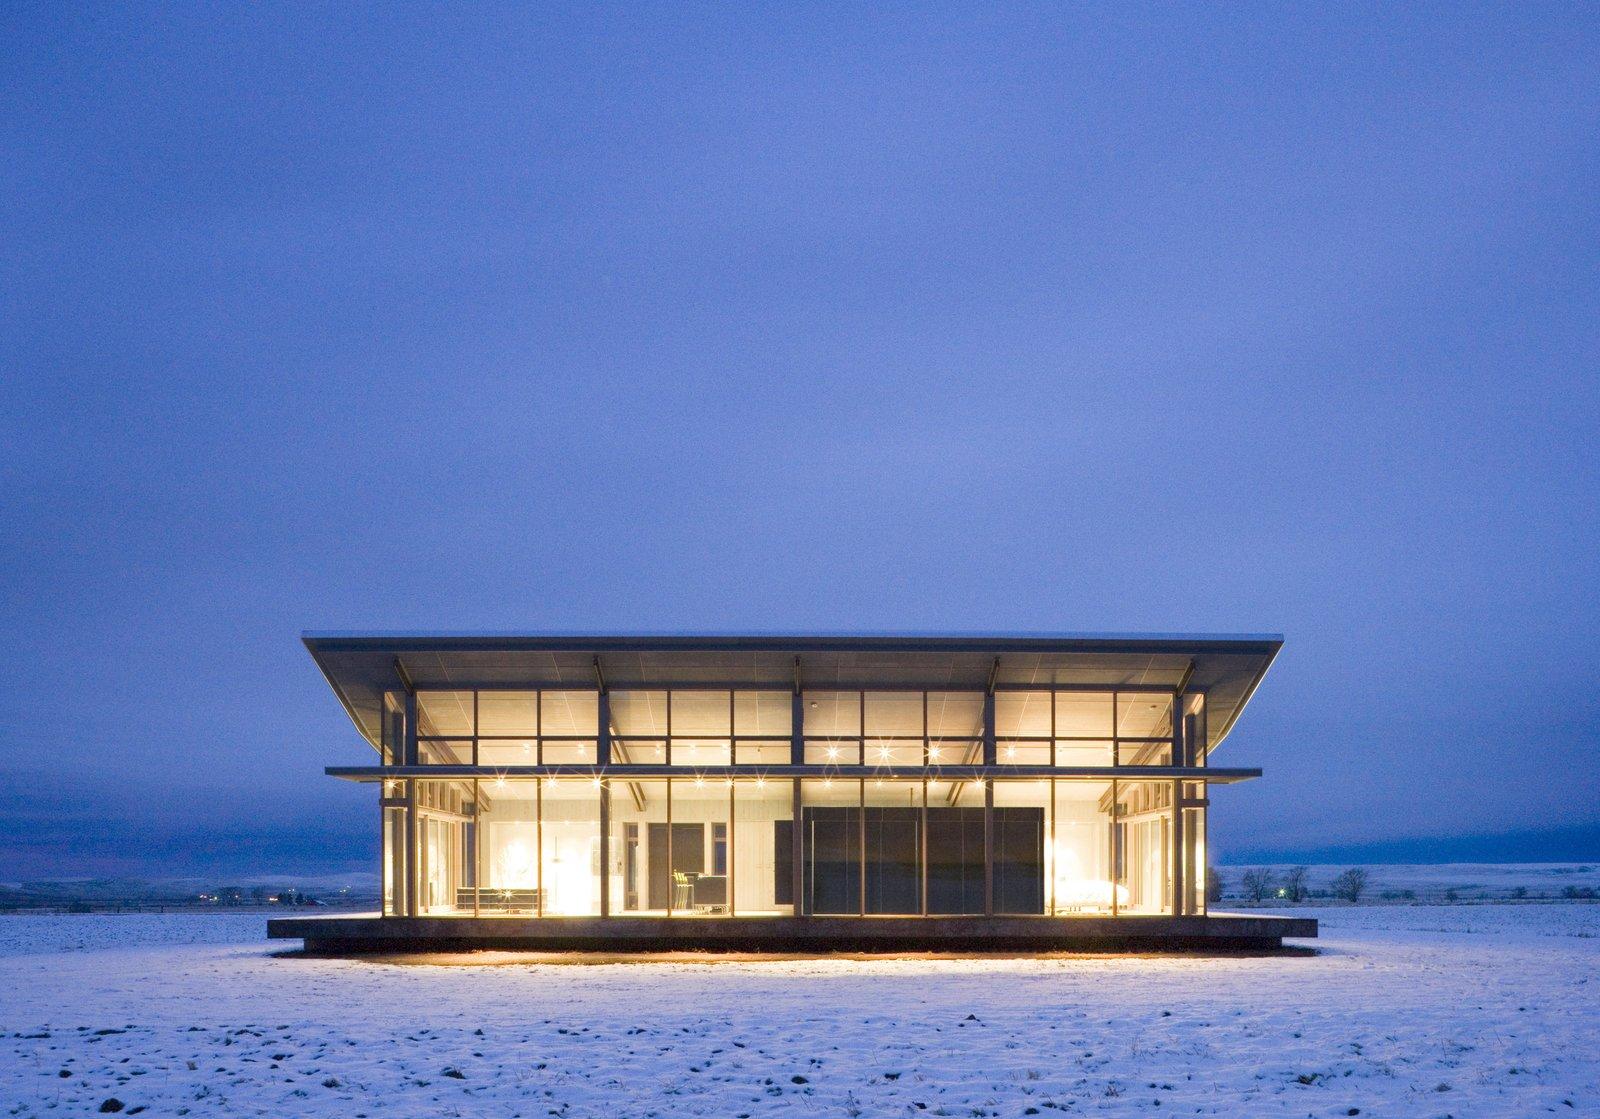 Glass Farmhouse | Olson Kundig Tagged: Exterior, House, Glass Siding Material, and Wood Siding Material.  Glass Farmhouse by Olson Kundig